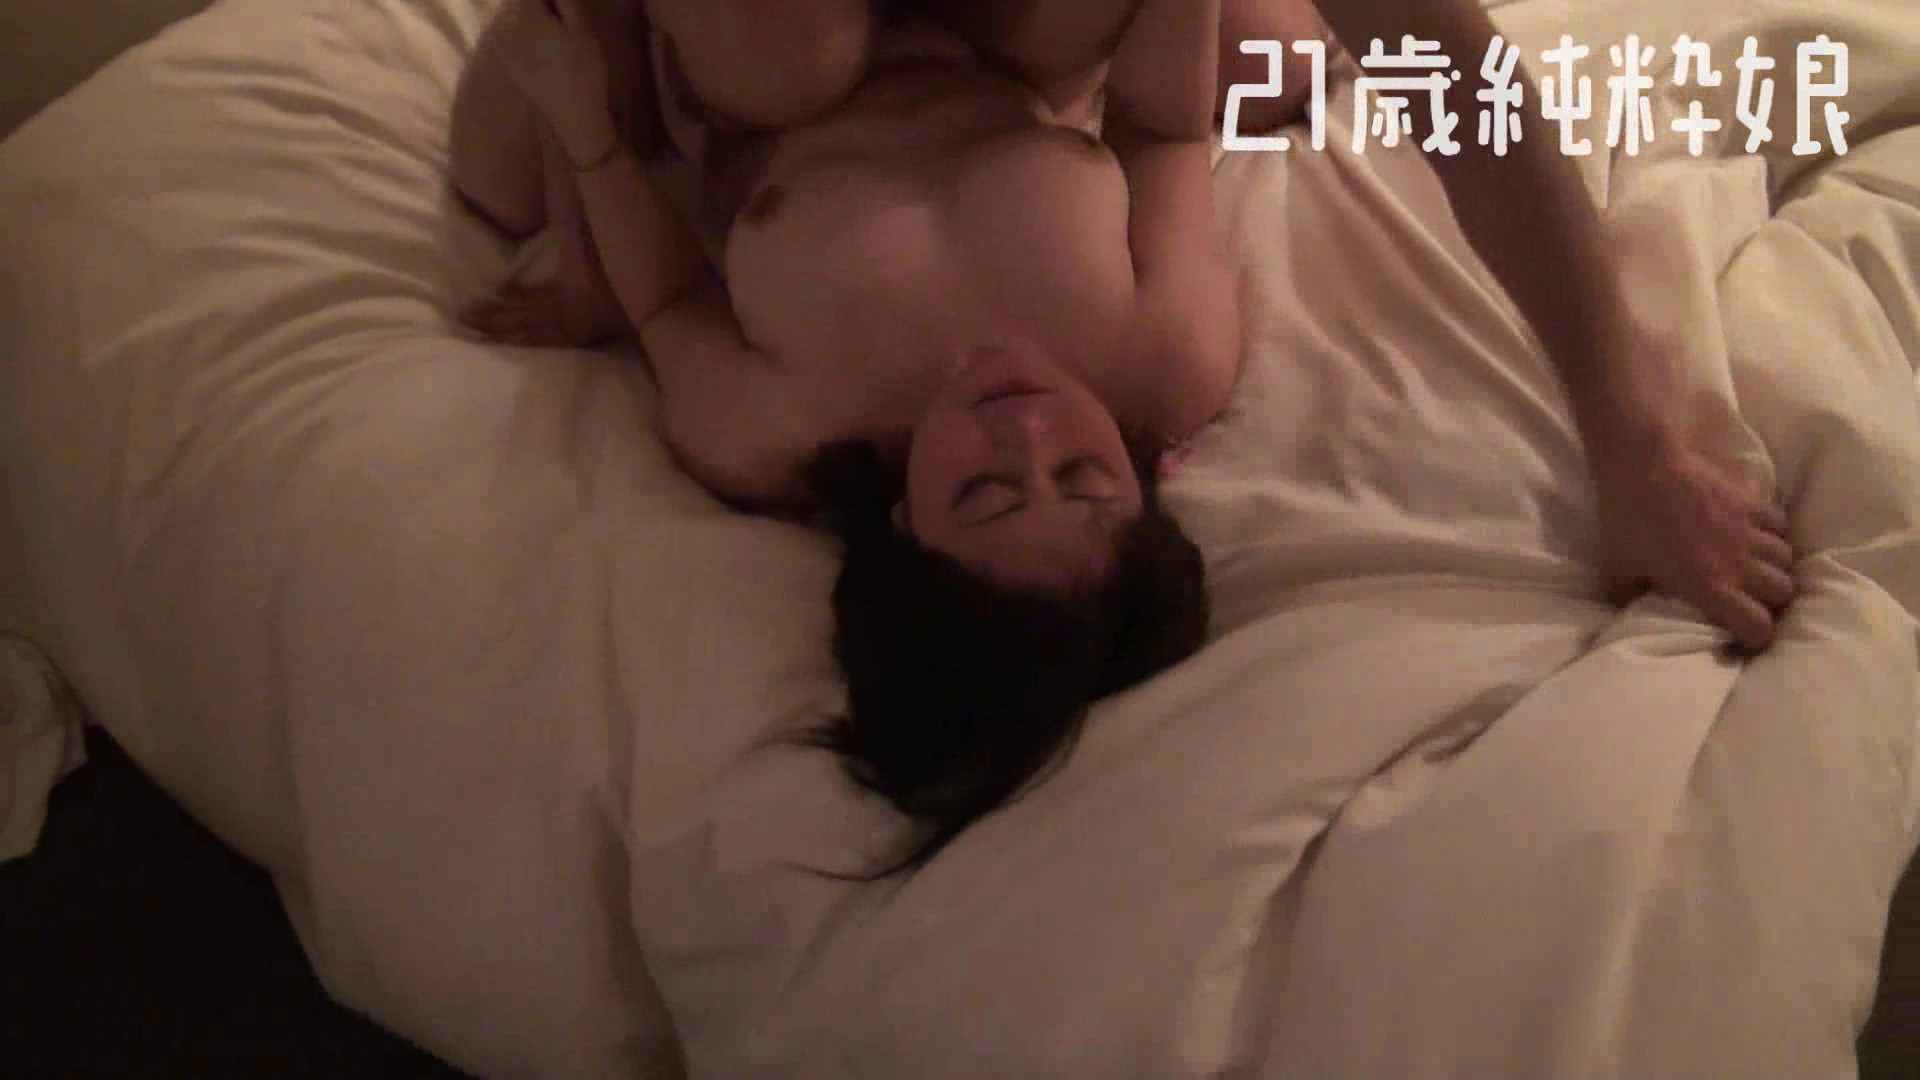 Gカップ21歳純粋嬢第2弾Vol.4 OL  82連発 64